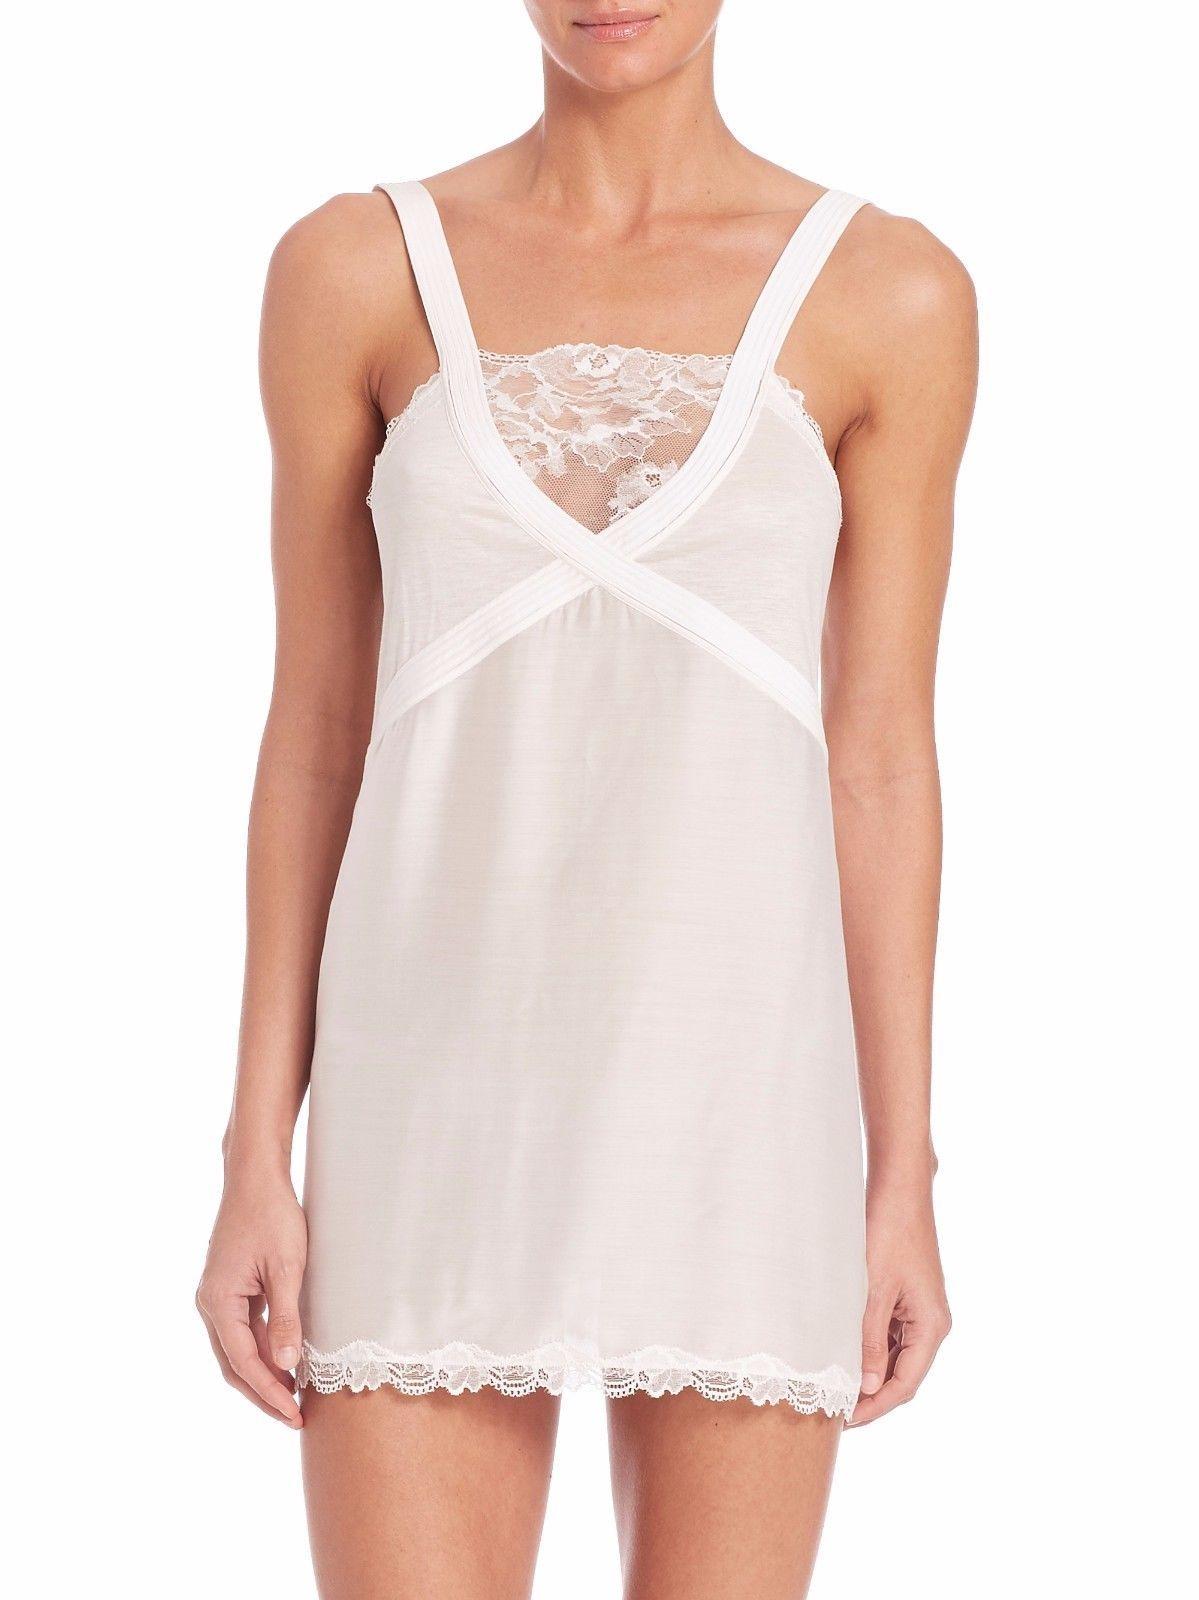 NWT lingerie sleep wear slip chemises flamingos tropical nightgown nightie women